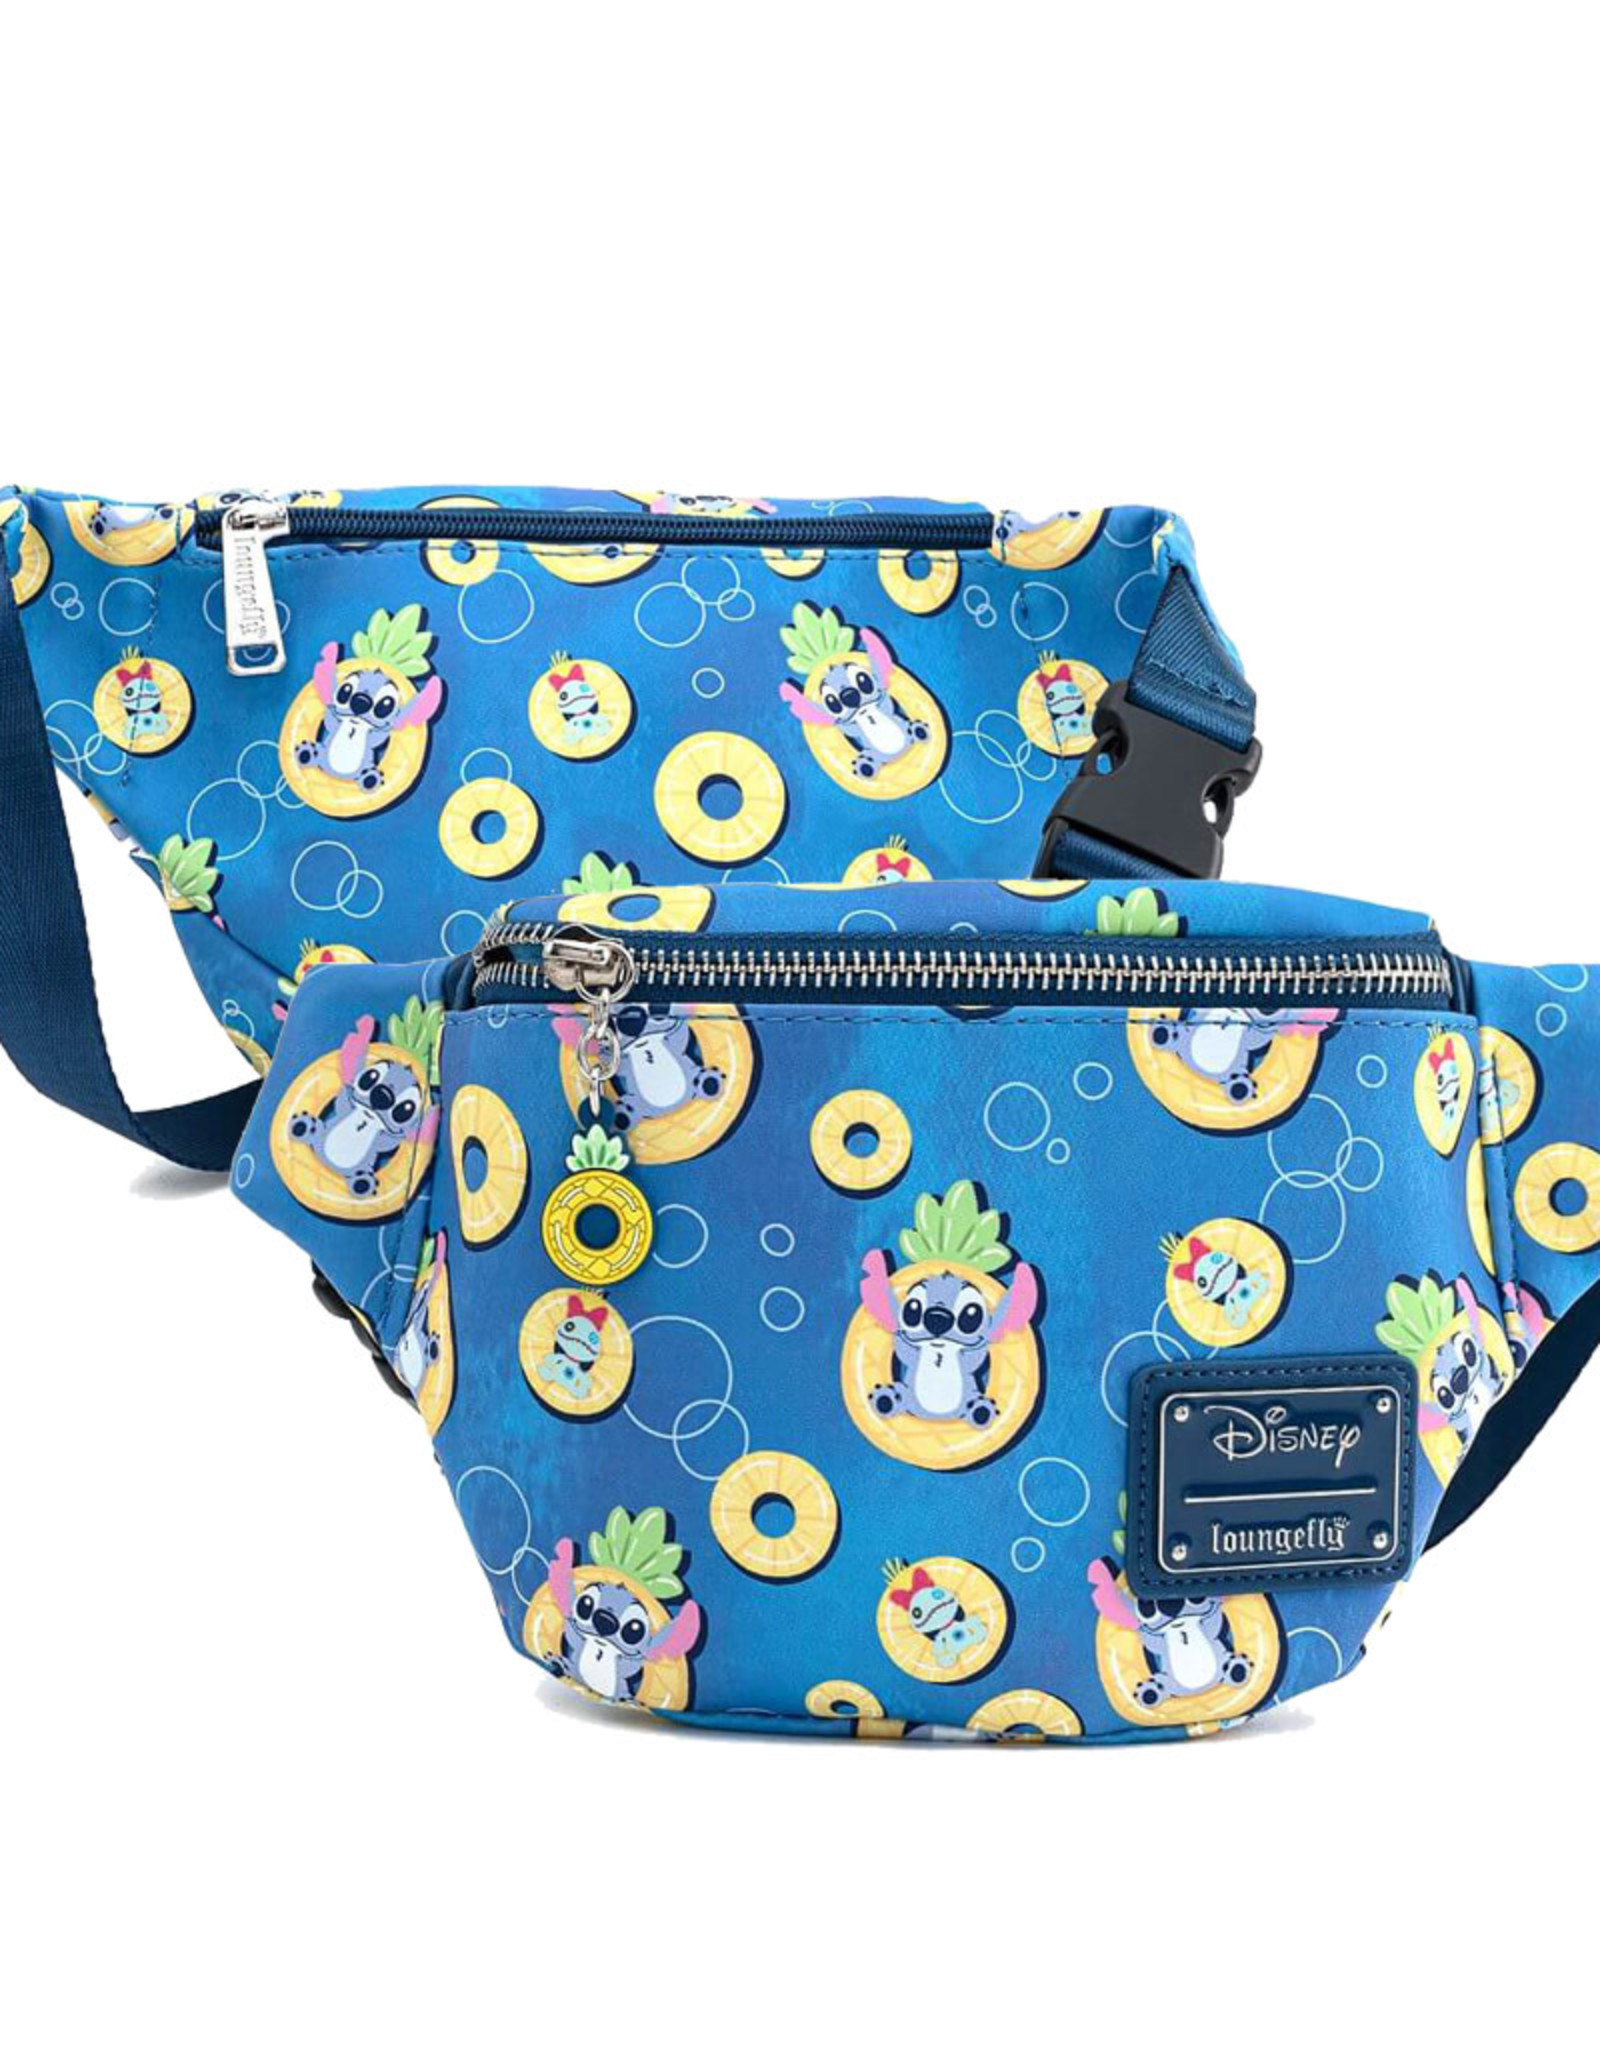 Disney Disney ( Loungefly Fanny Pack  ) Stitch et Scrump